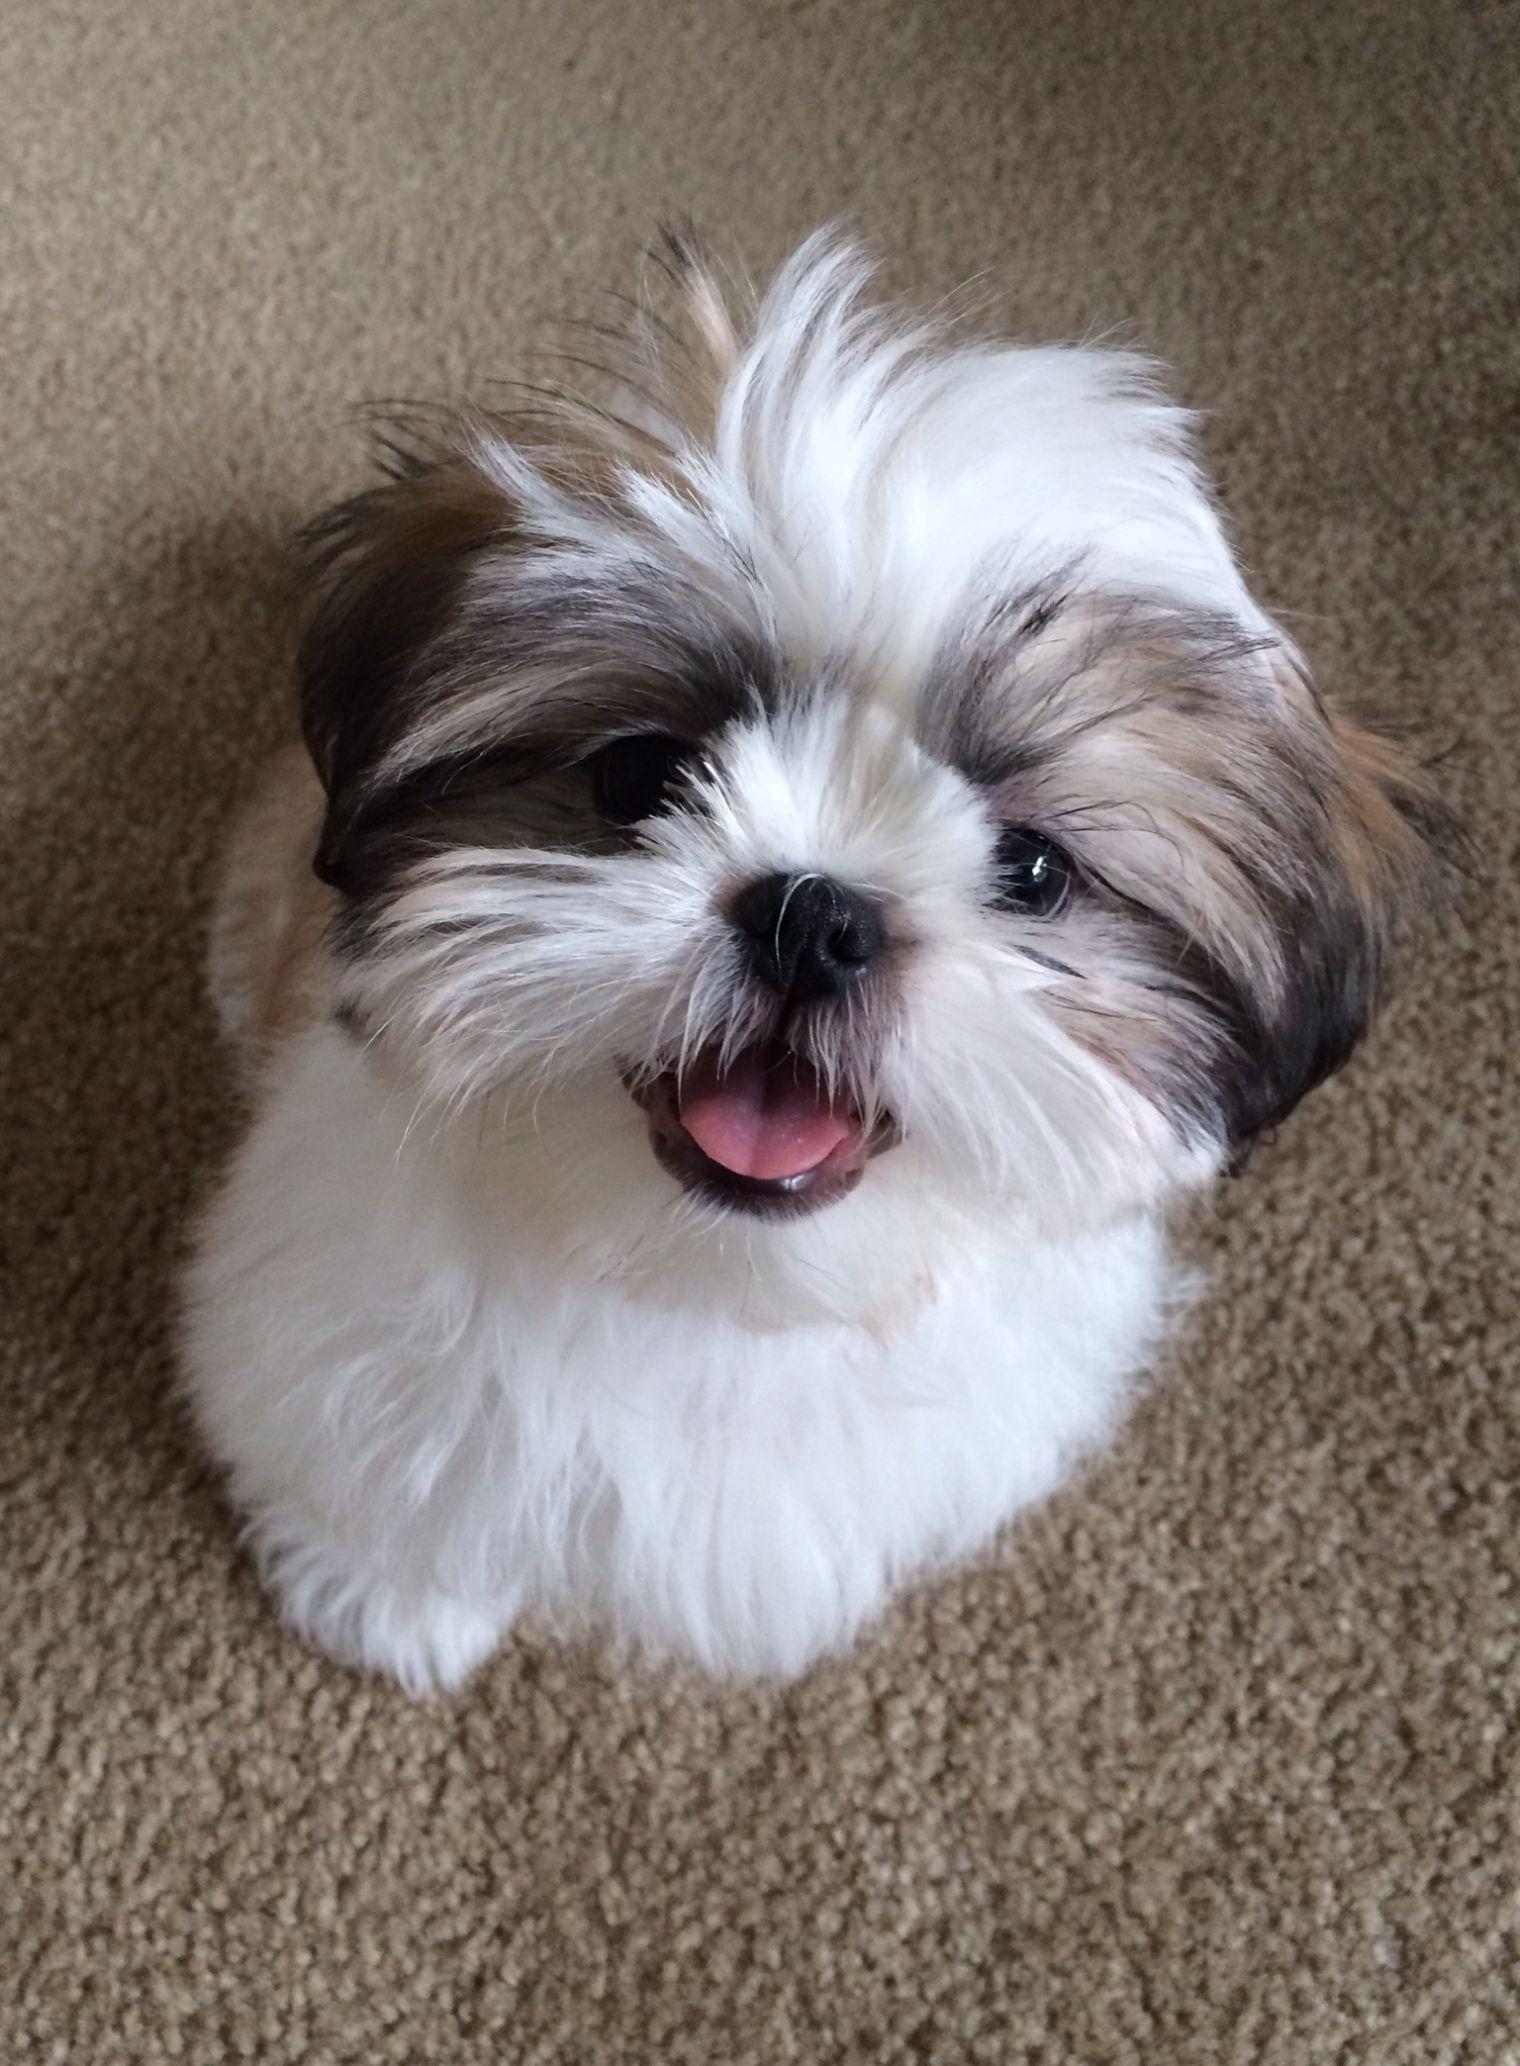 Shih Tzu In 2020 Shitzu Puppies Shih Tzu Puppy Puppies